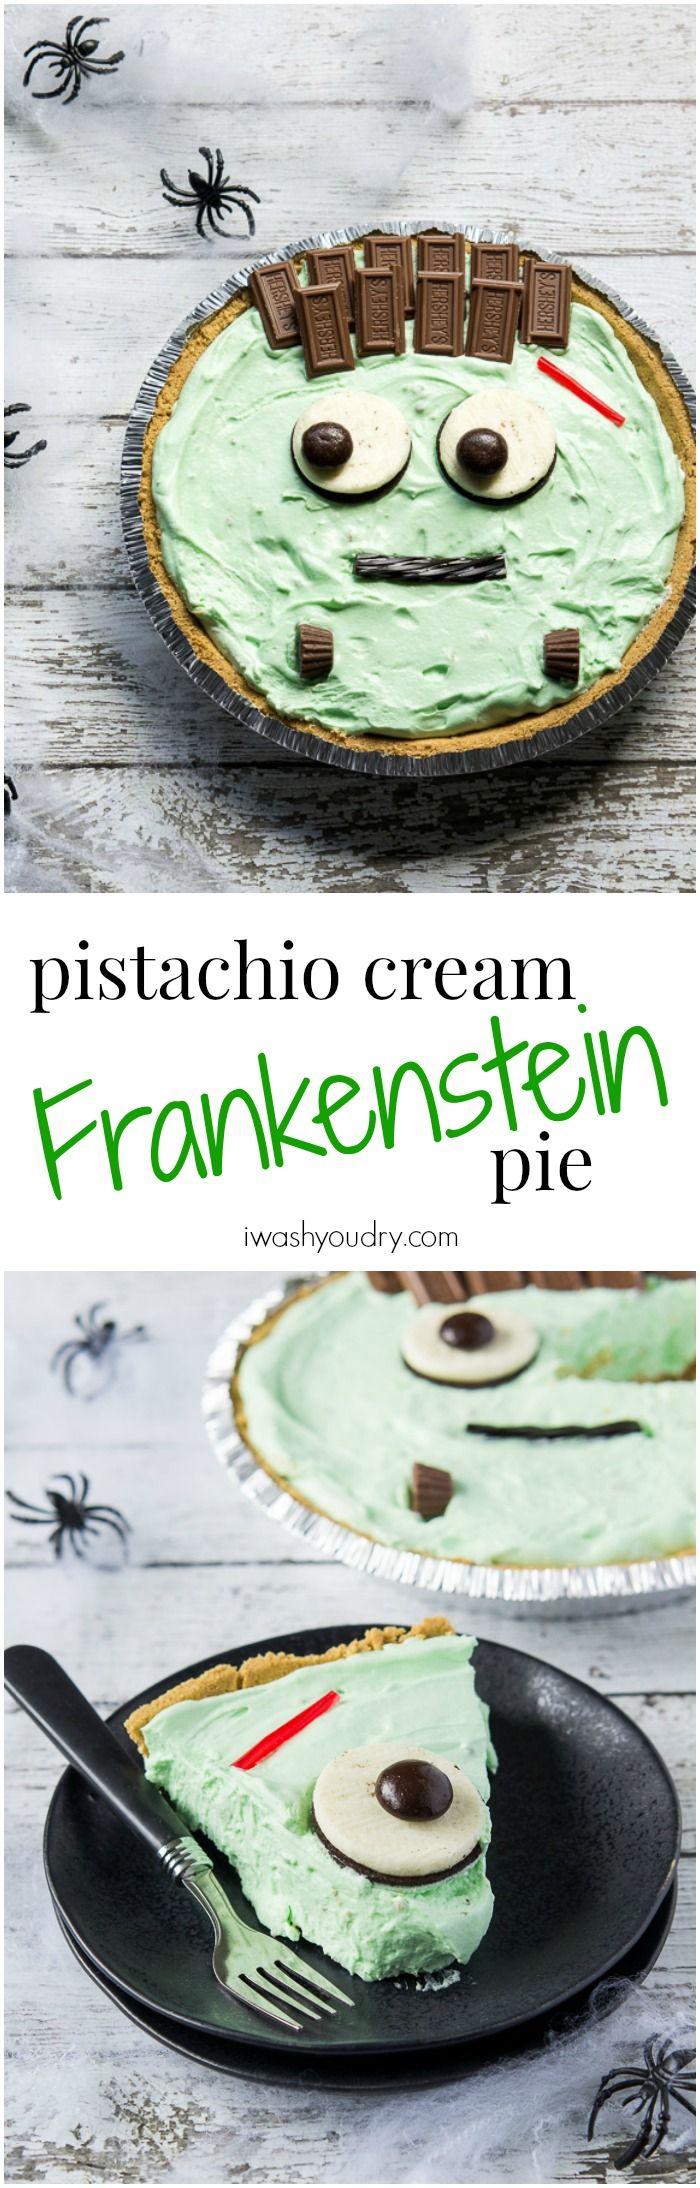 Pistachio Cream Frankenstein Pie! The perfect last-minute easy Halloween treat!